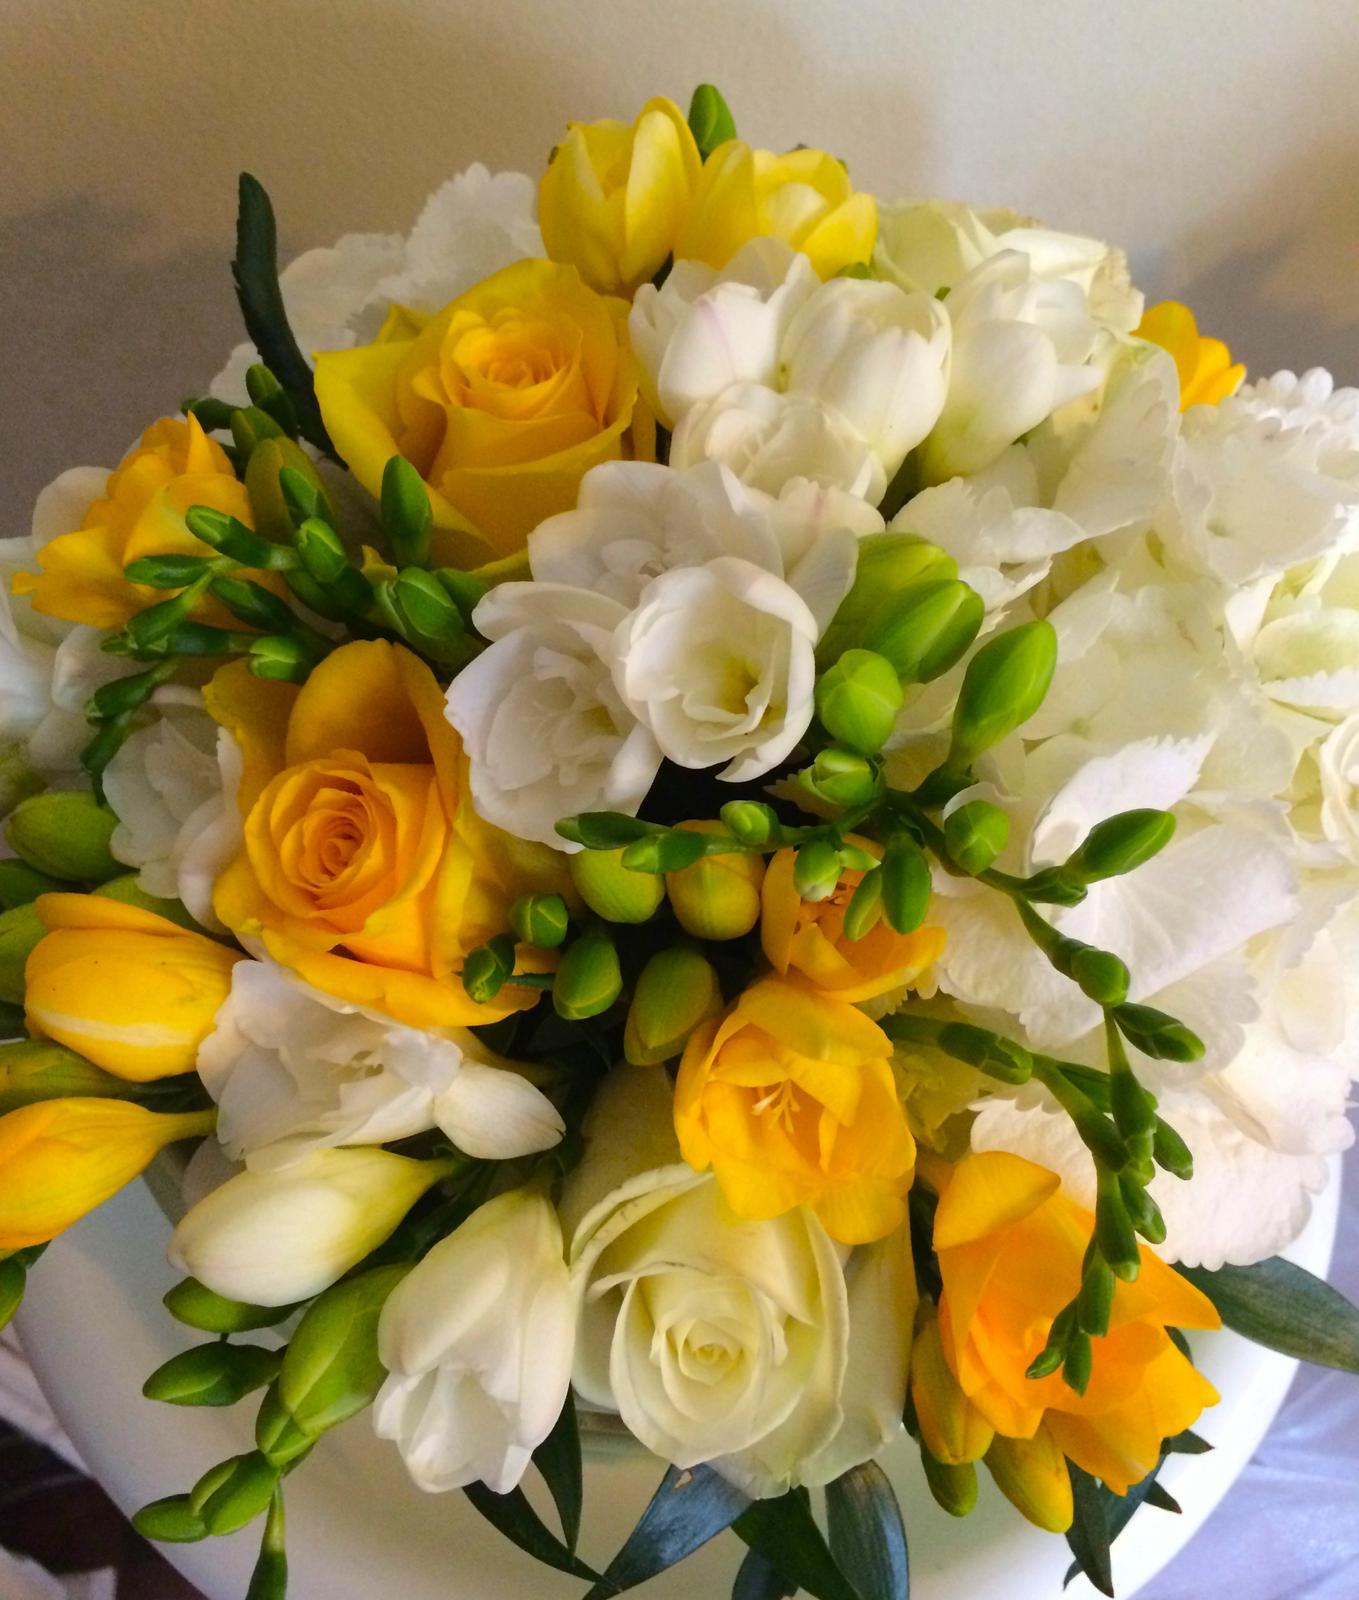 Žluto- bílá svatební kytice - Obrázek č. 1